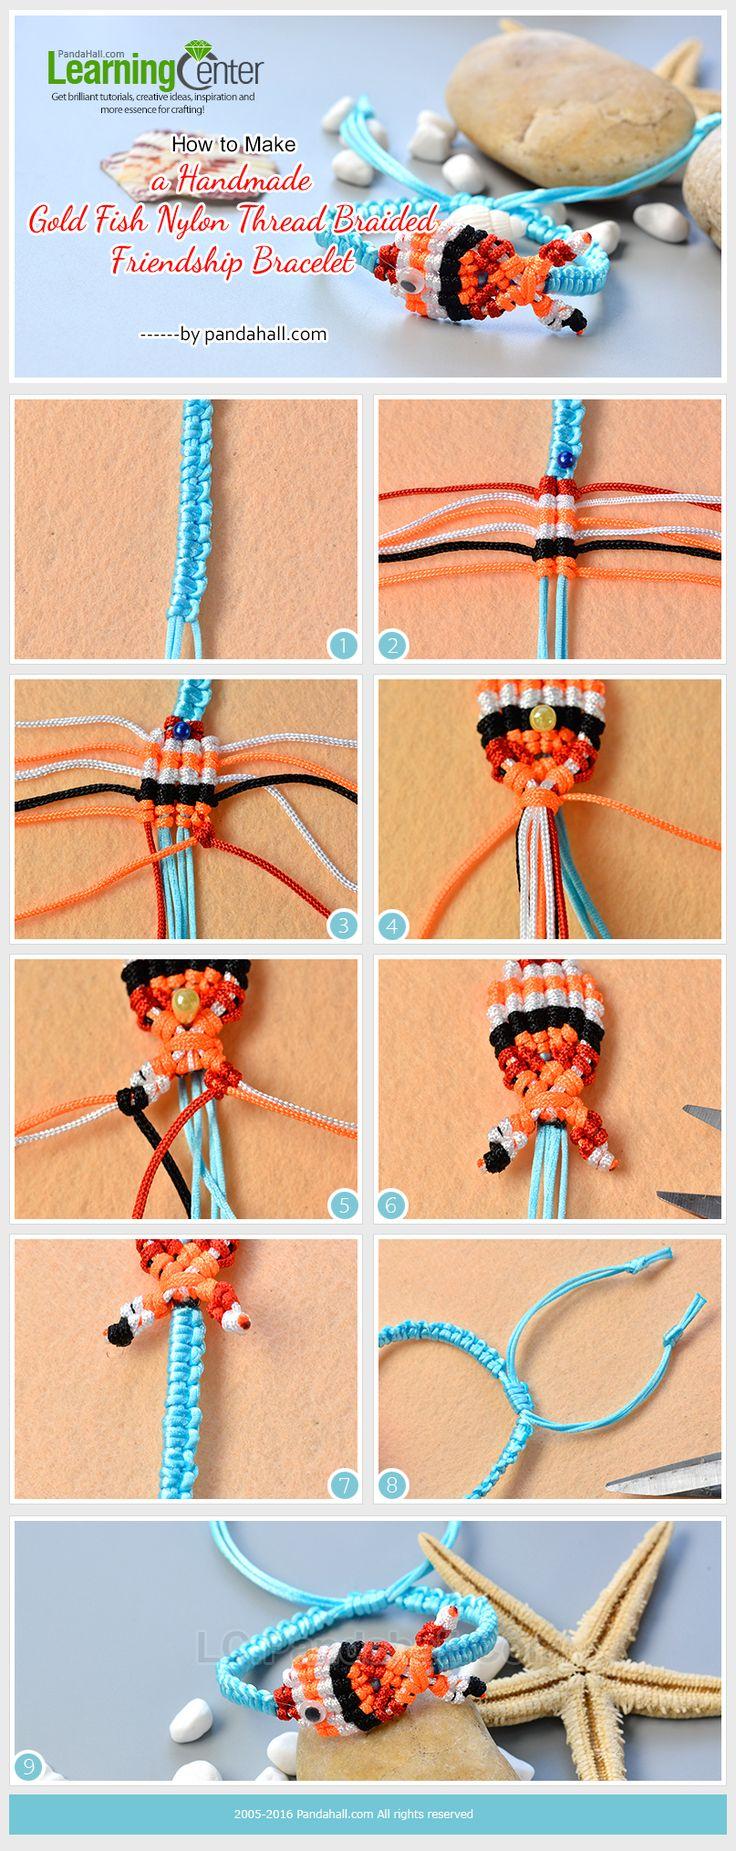 How to Make a Handmade Gold Fish Nylon Thread Braided Friendship Bracelet